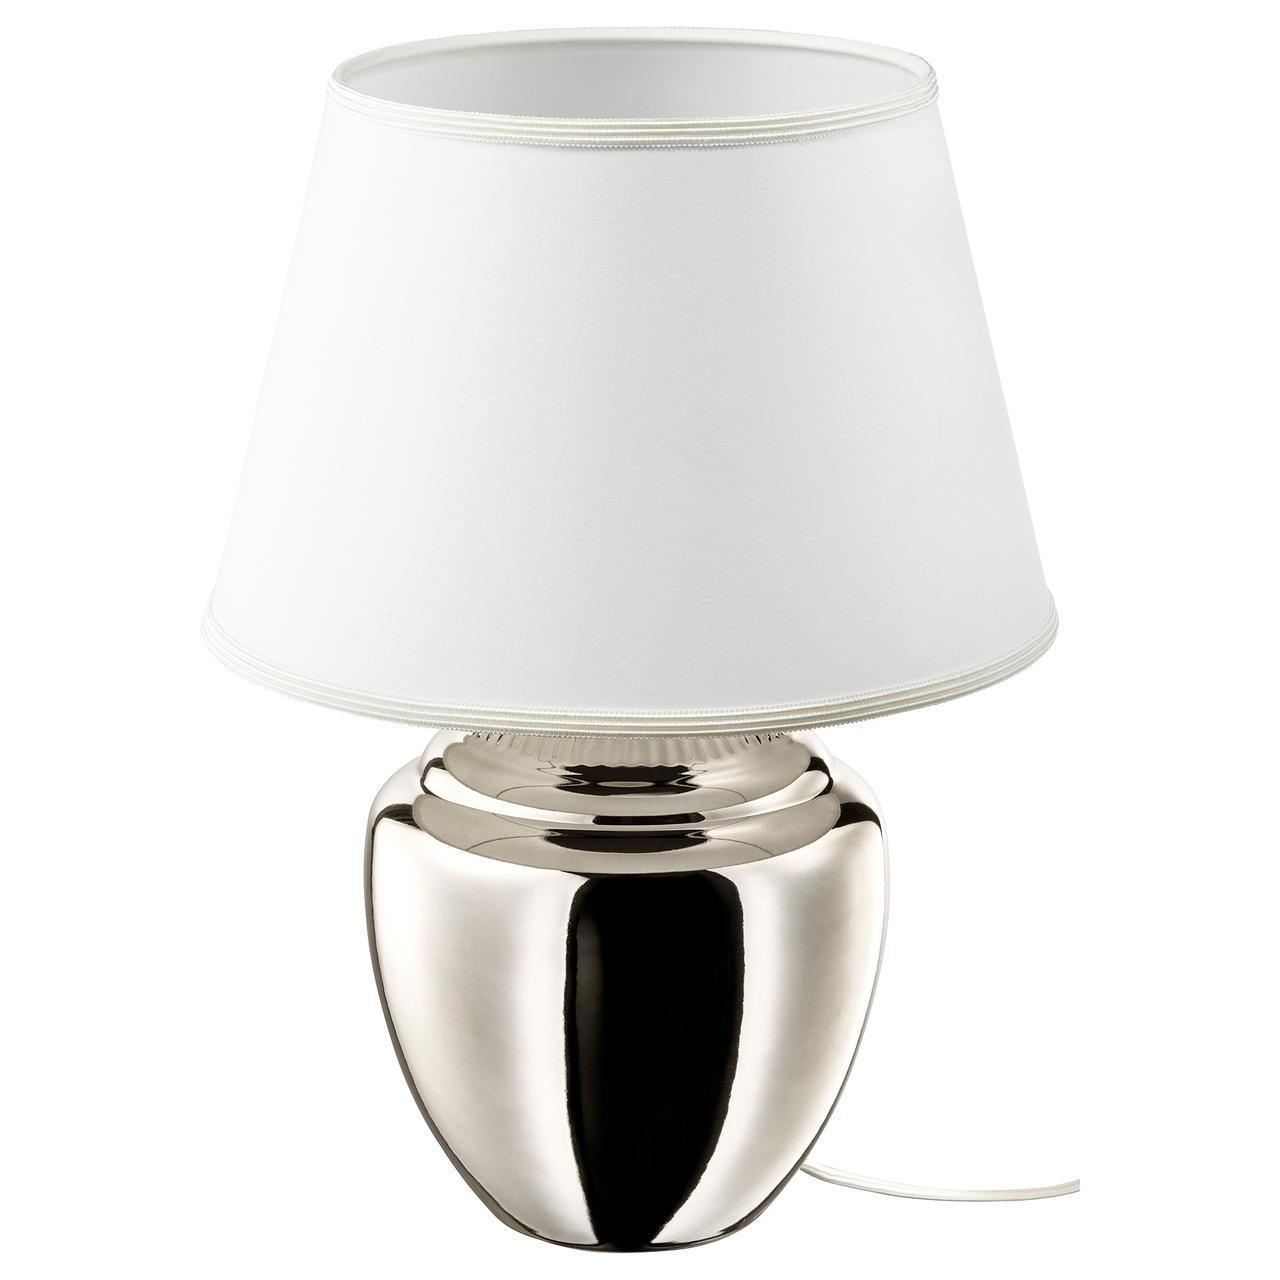 IKEA RICKARUM Наcтольная лампа, серебро  (803.495.34)